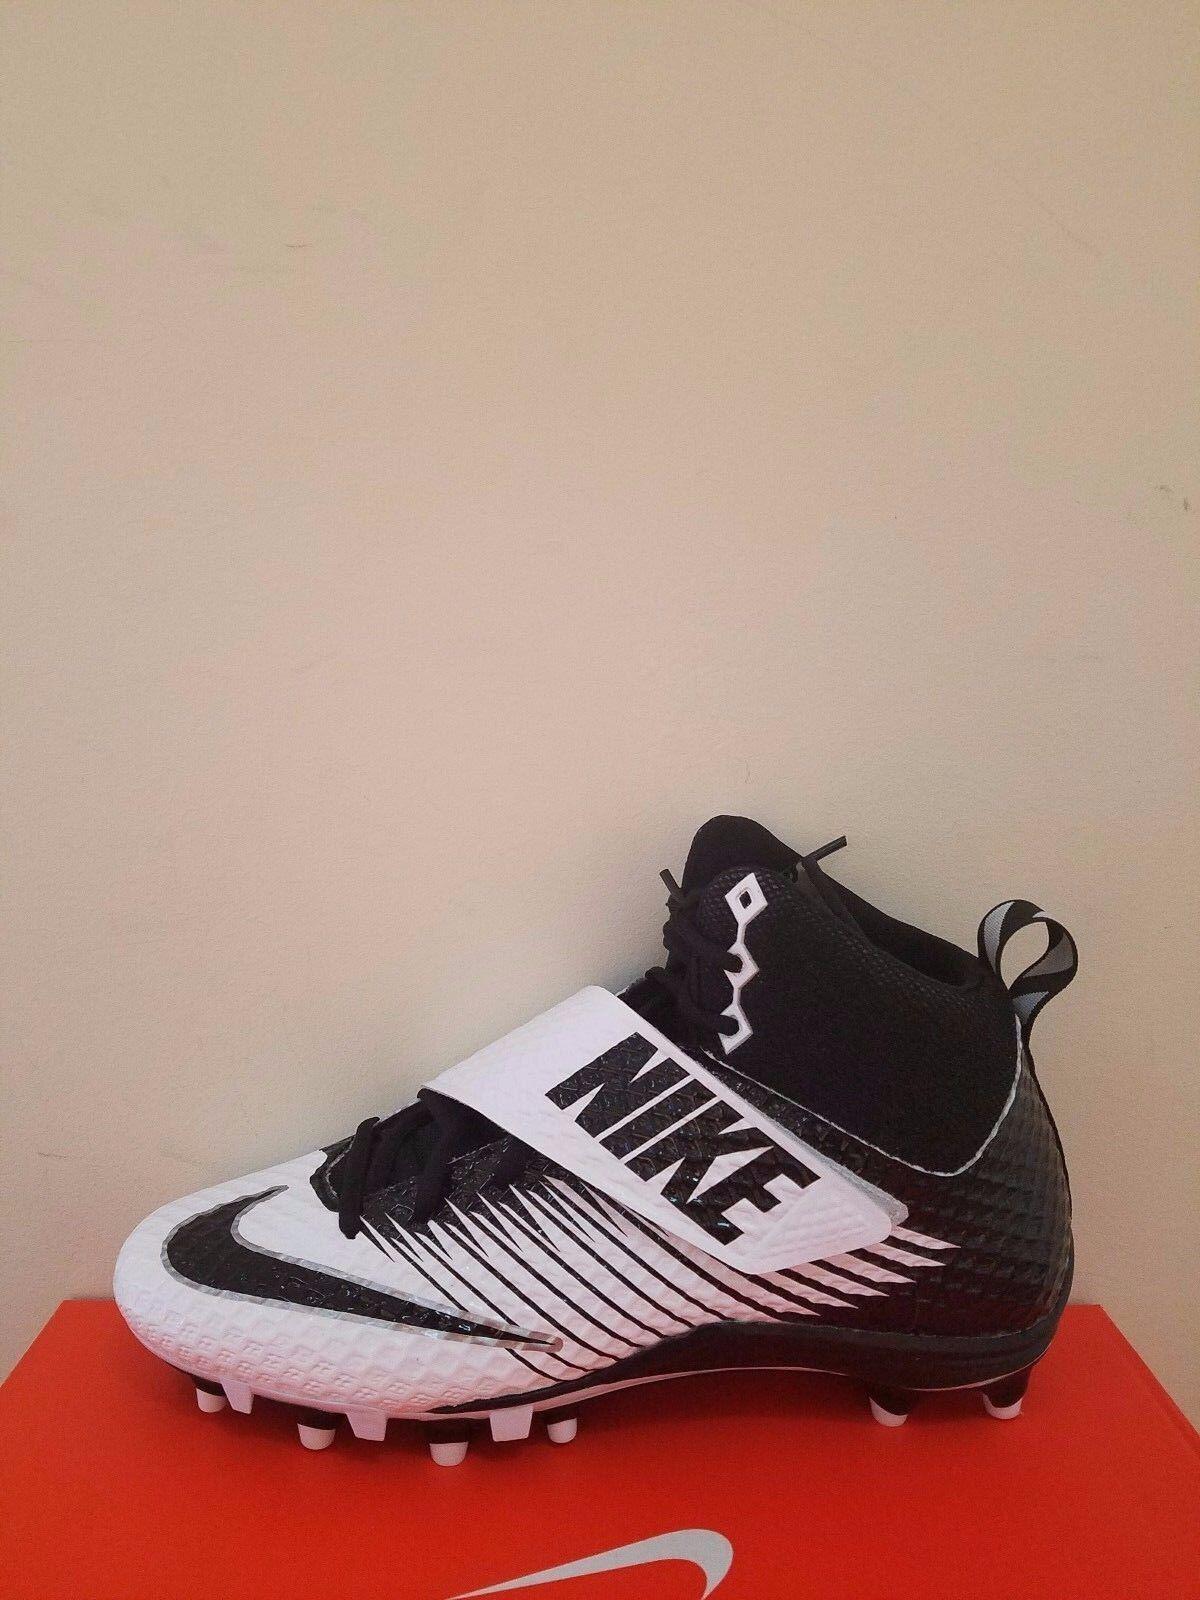 Nike Football hombre lunarbeast Pro TD Football Nike cleat comodo 9718f4